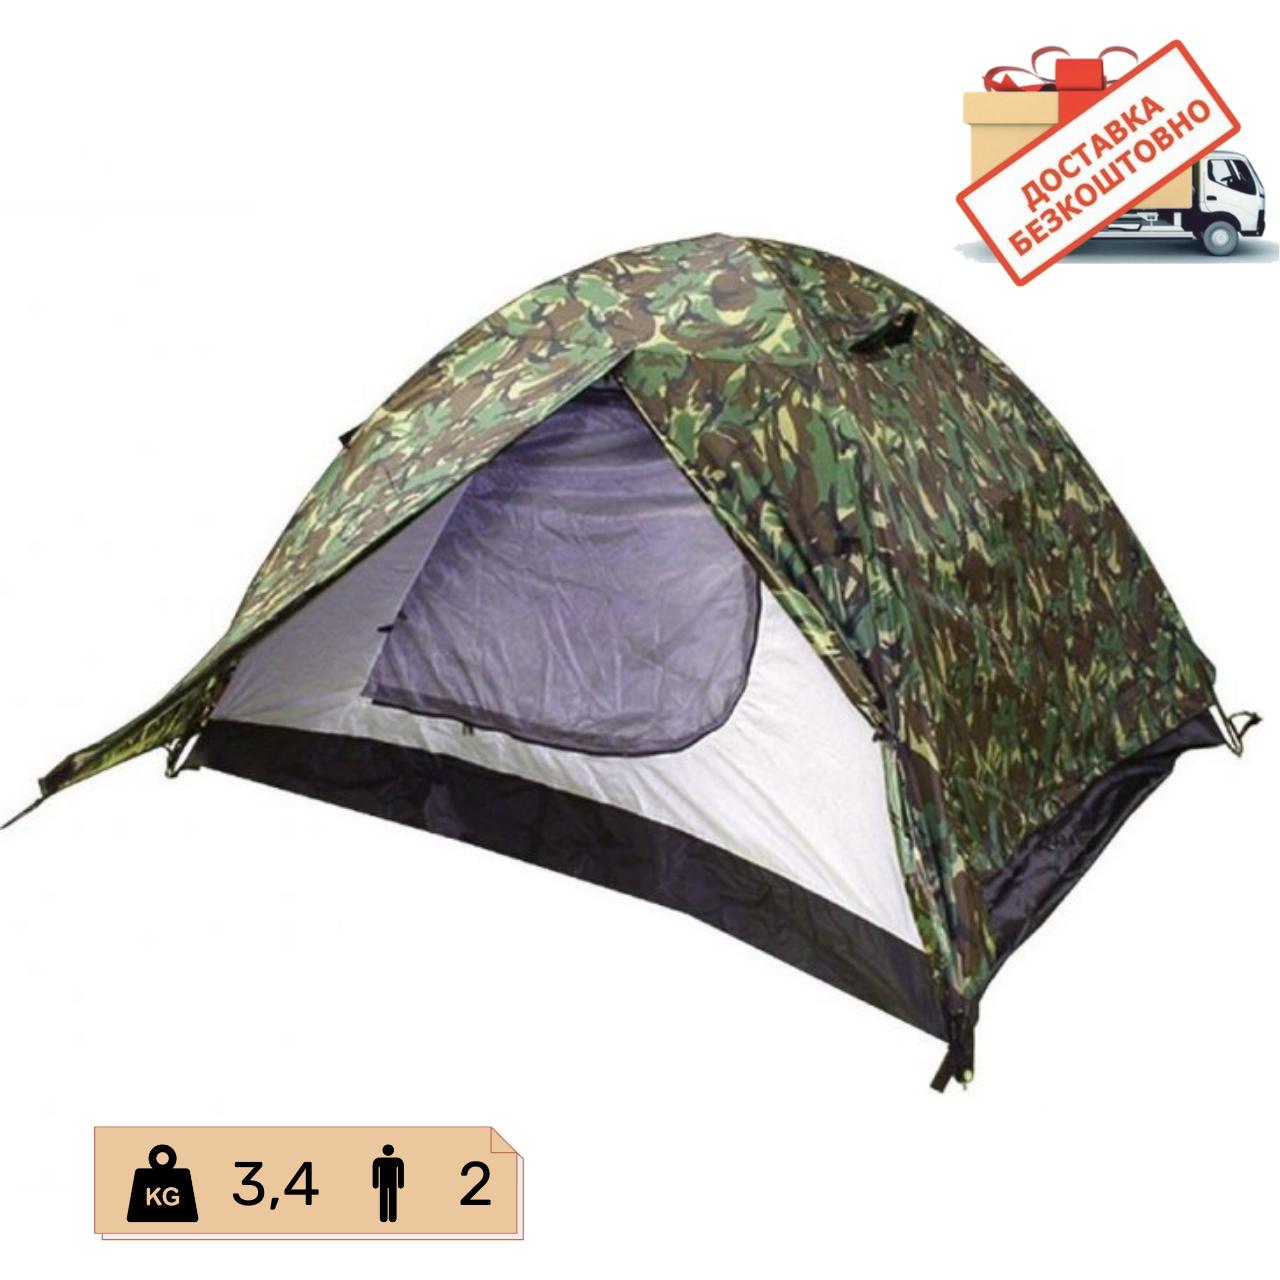 Намет Tramp Lite Hunter 2 м TLT-008. Палатка туристична. Намет туристичний